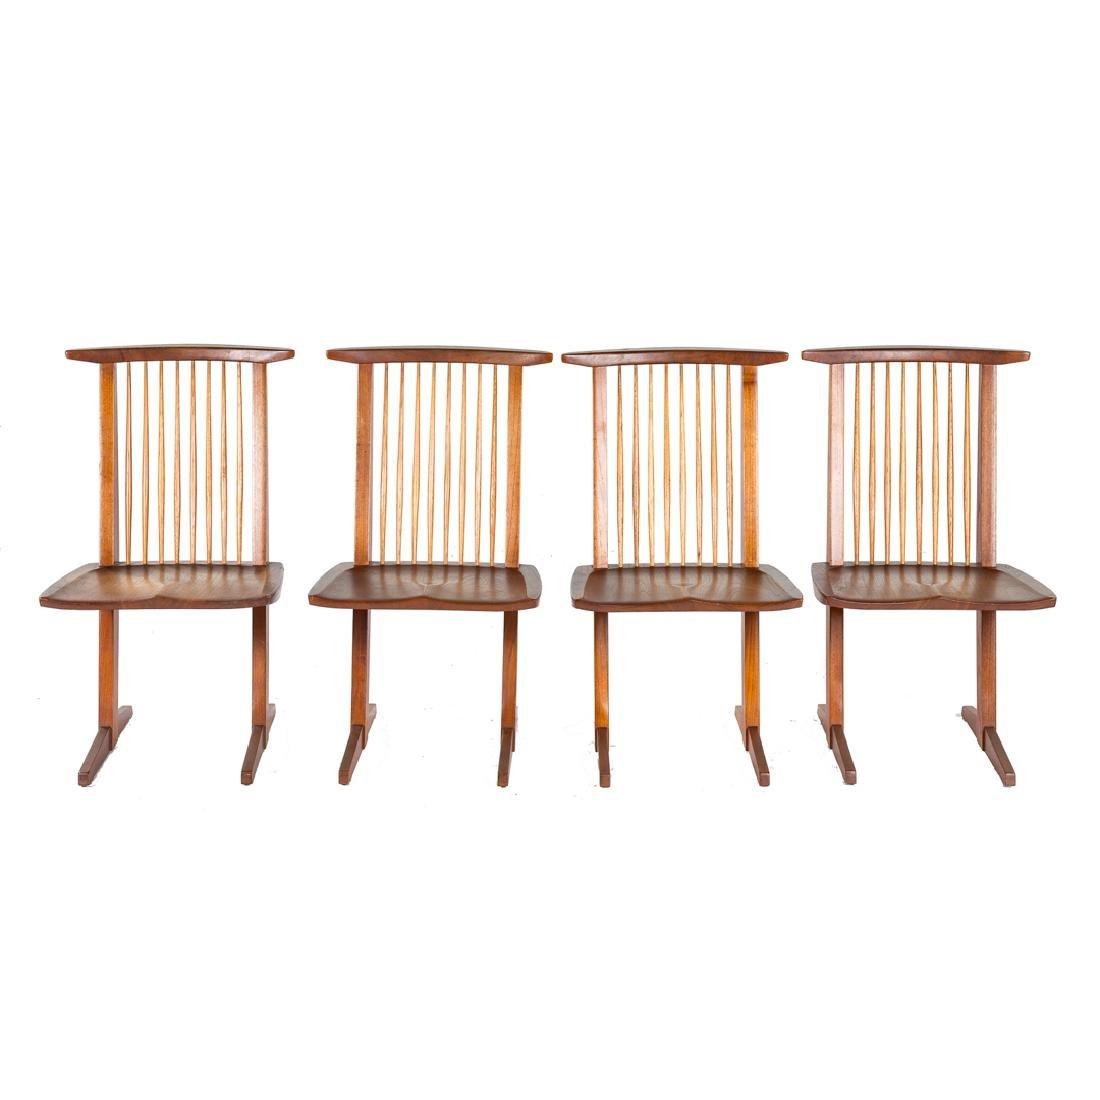 Set of Four George Nakashima Conoid Chairs